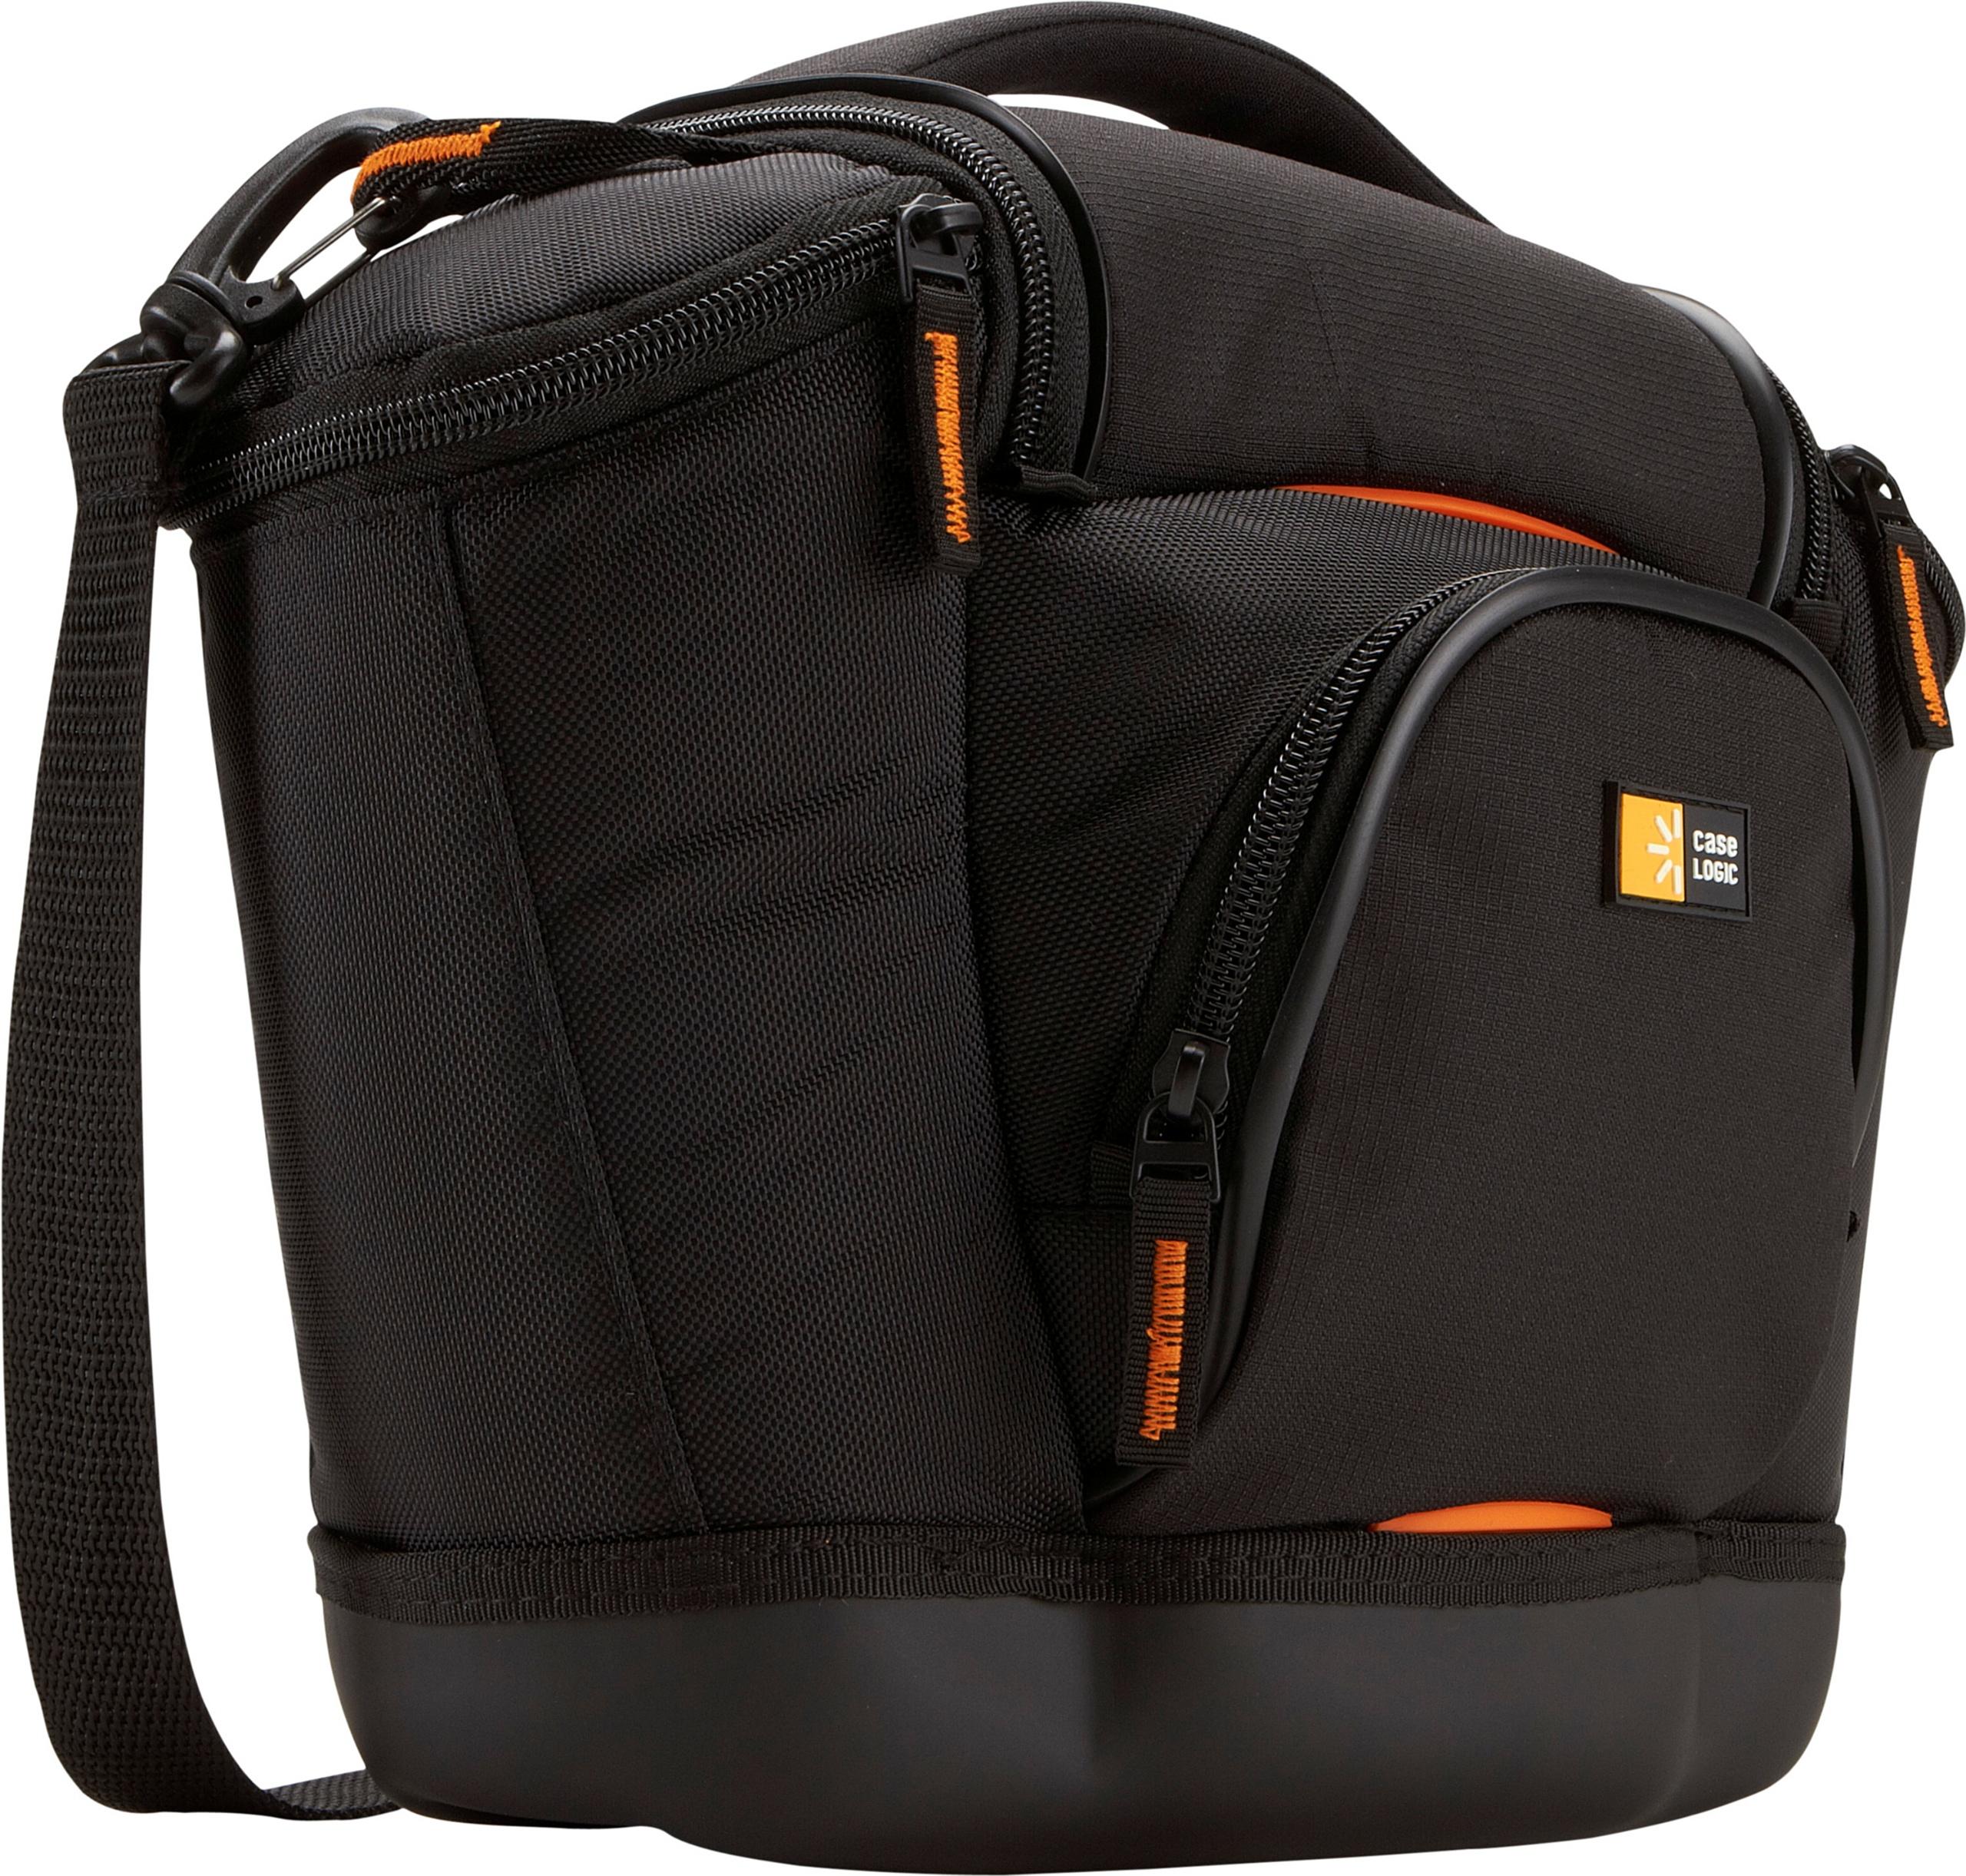 Case Logic SLRC-202 Medium SLR Camera Bag (Black) by Case Logic